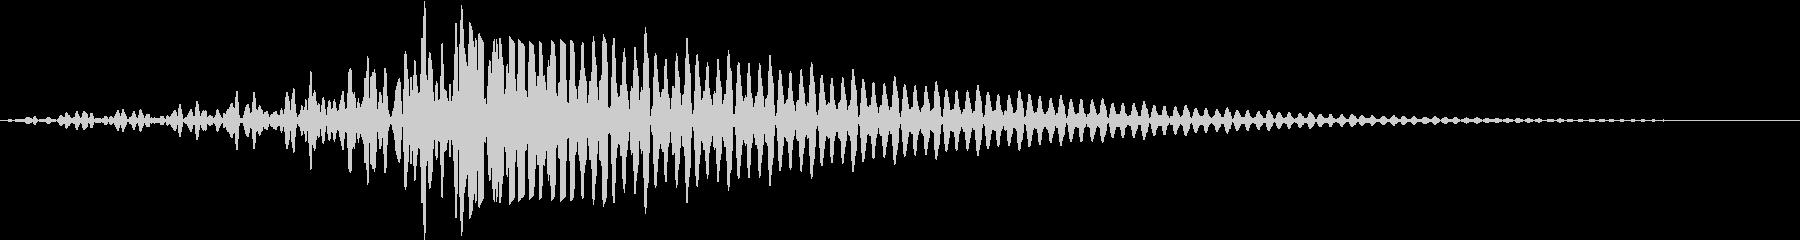 SF通過音02-01の未再生の波形